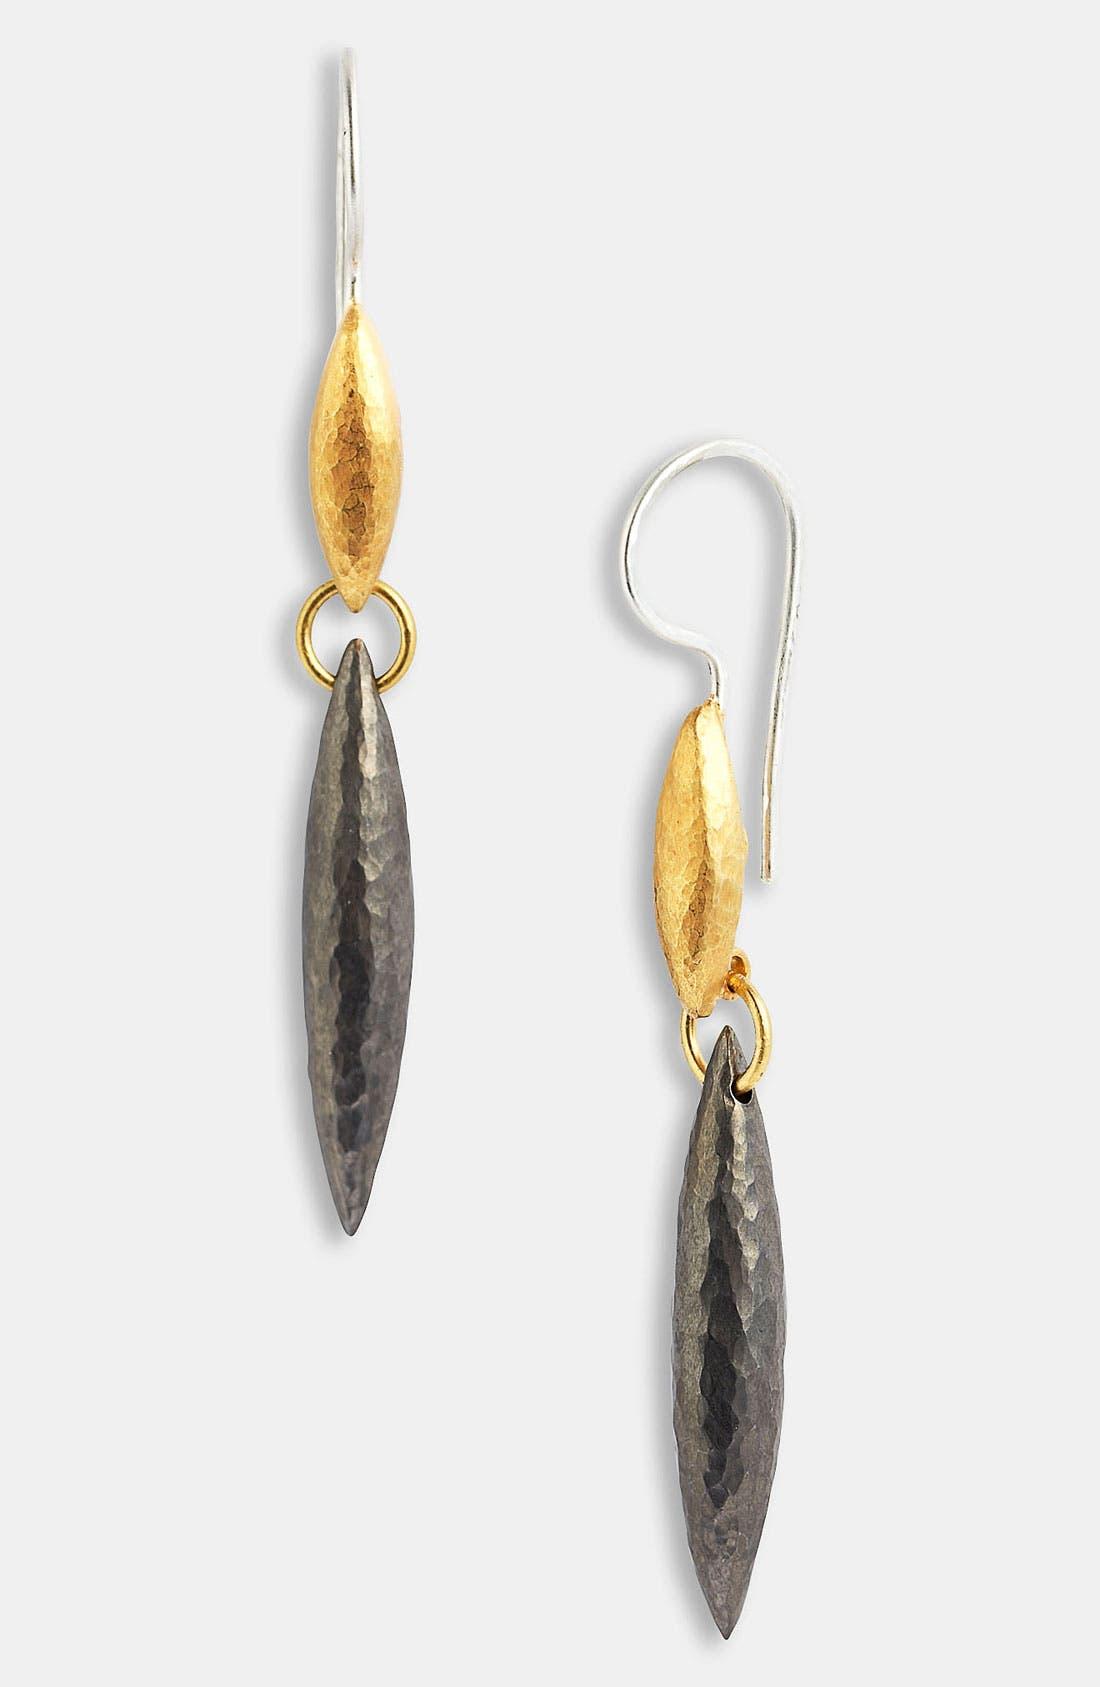 Alternate Image 1 Selected - Gurhan 'Wheat' Gold & Blackened Silver Earrings